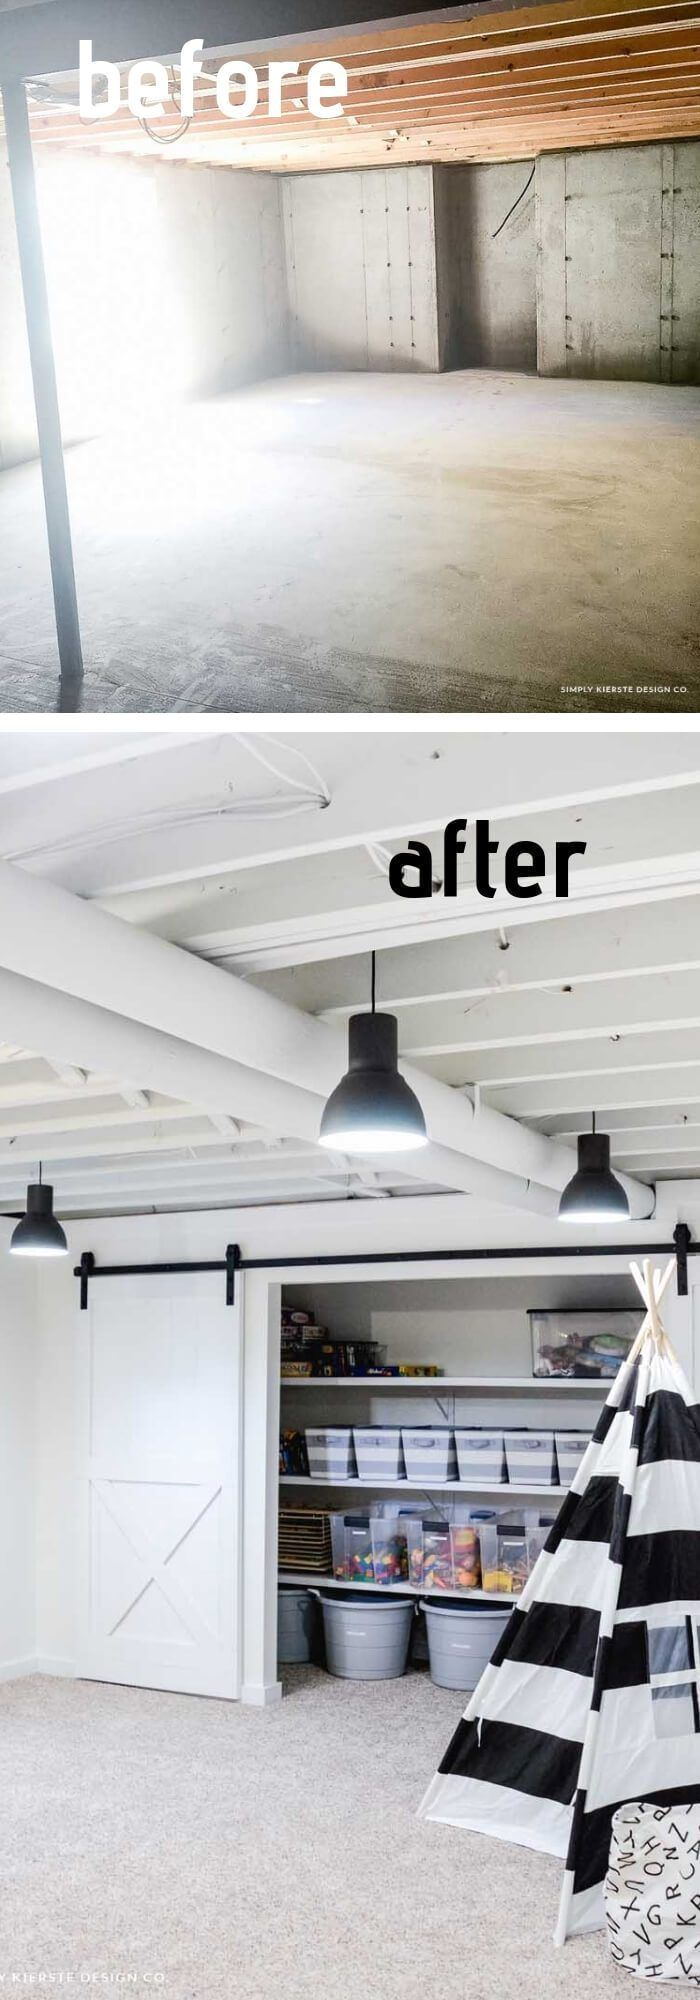 15+ Best DIY Basement Ceiling Ideas & Designs For 2019